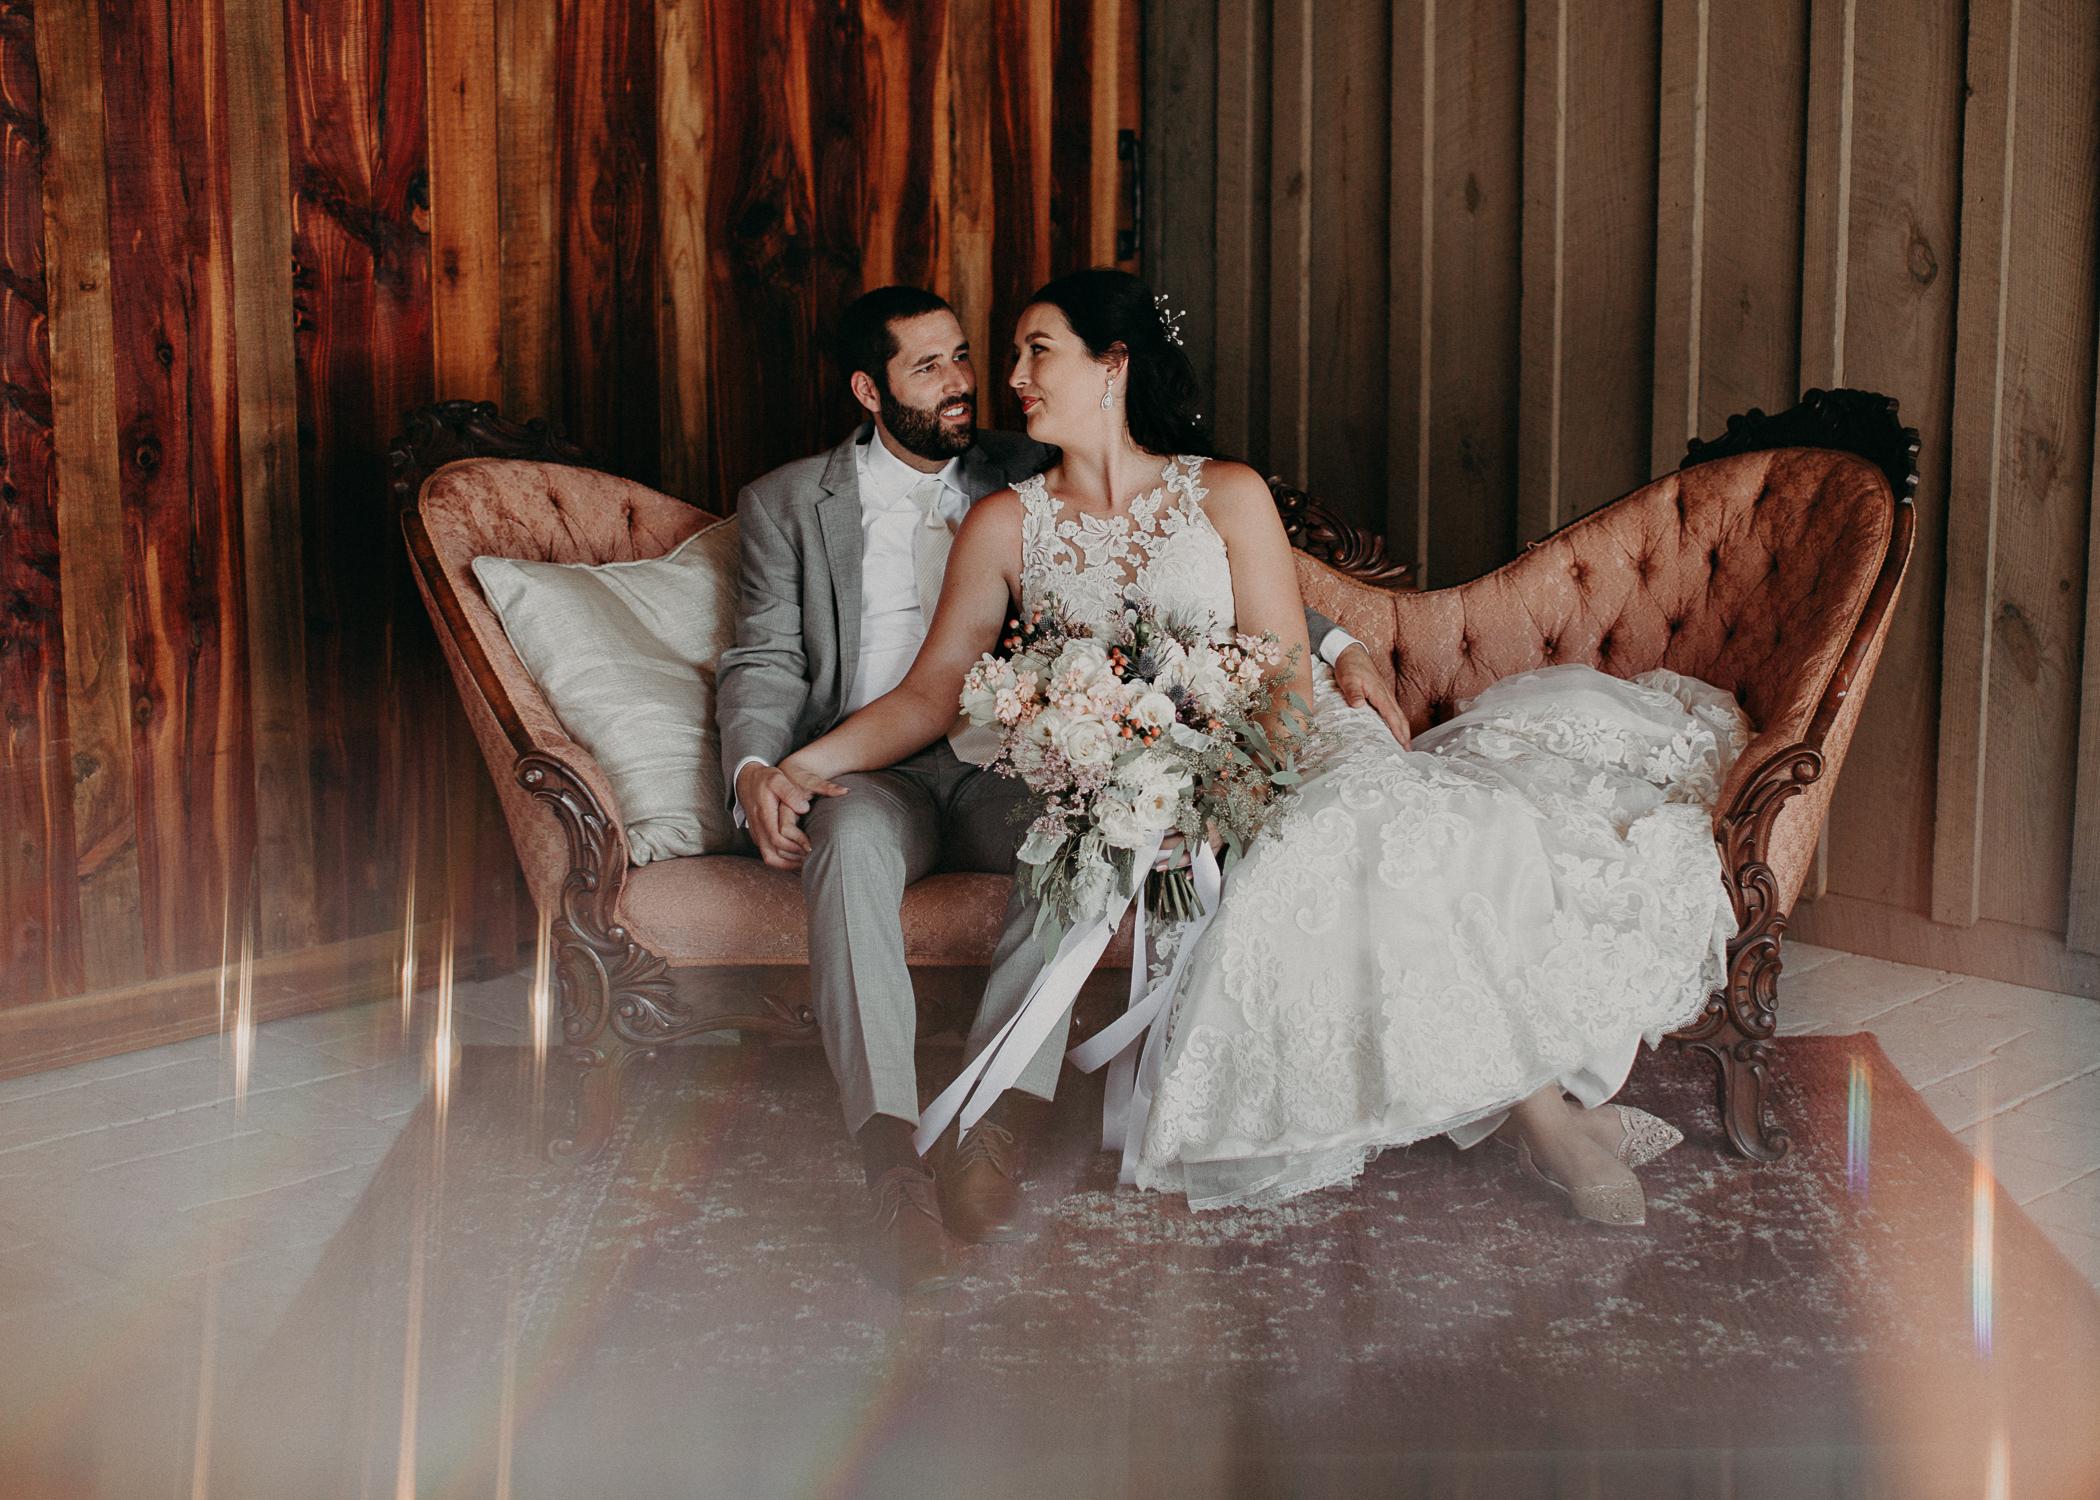 51 wedding day portraits bride and groom atlanta - georgia - ga wedding photographer .jpg